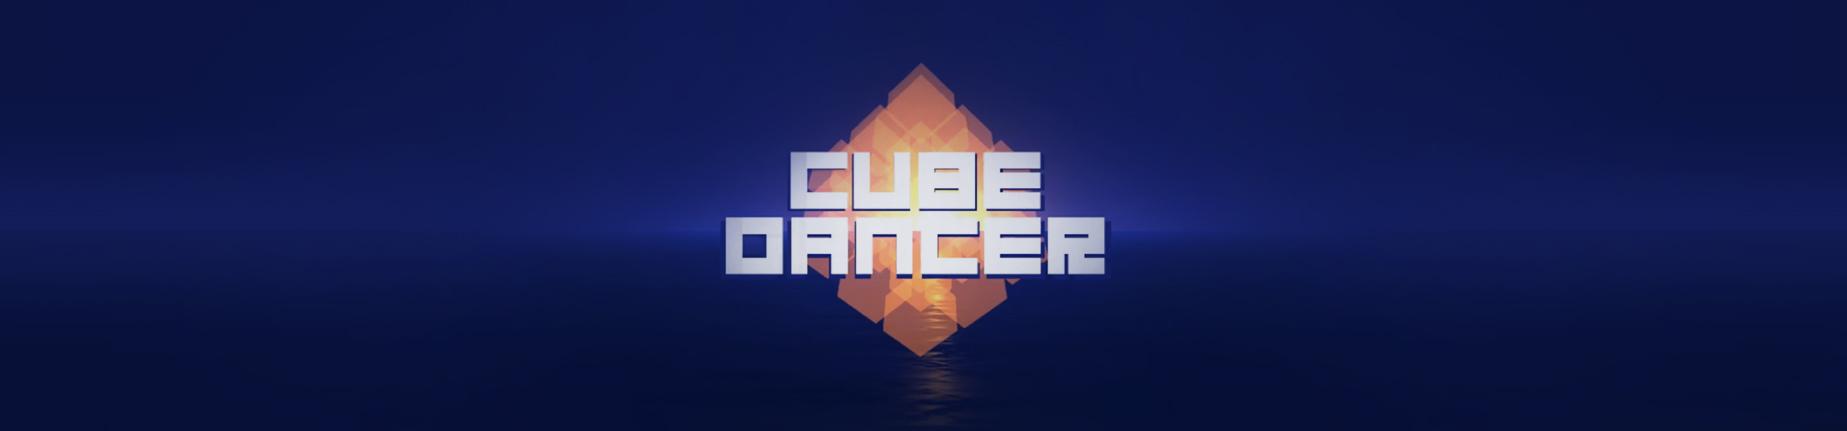 CUBE DANCER